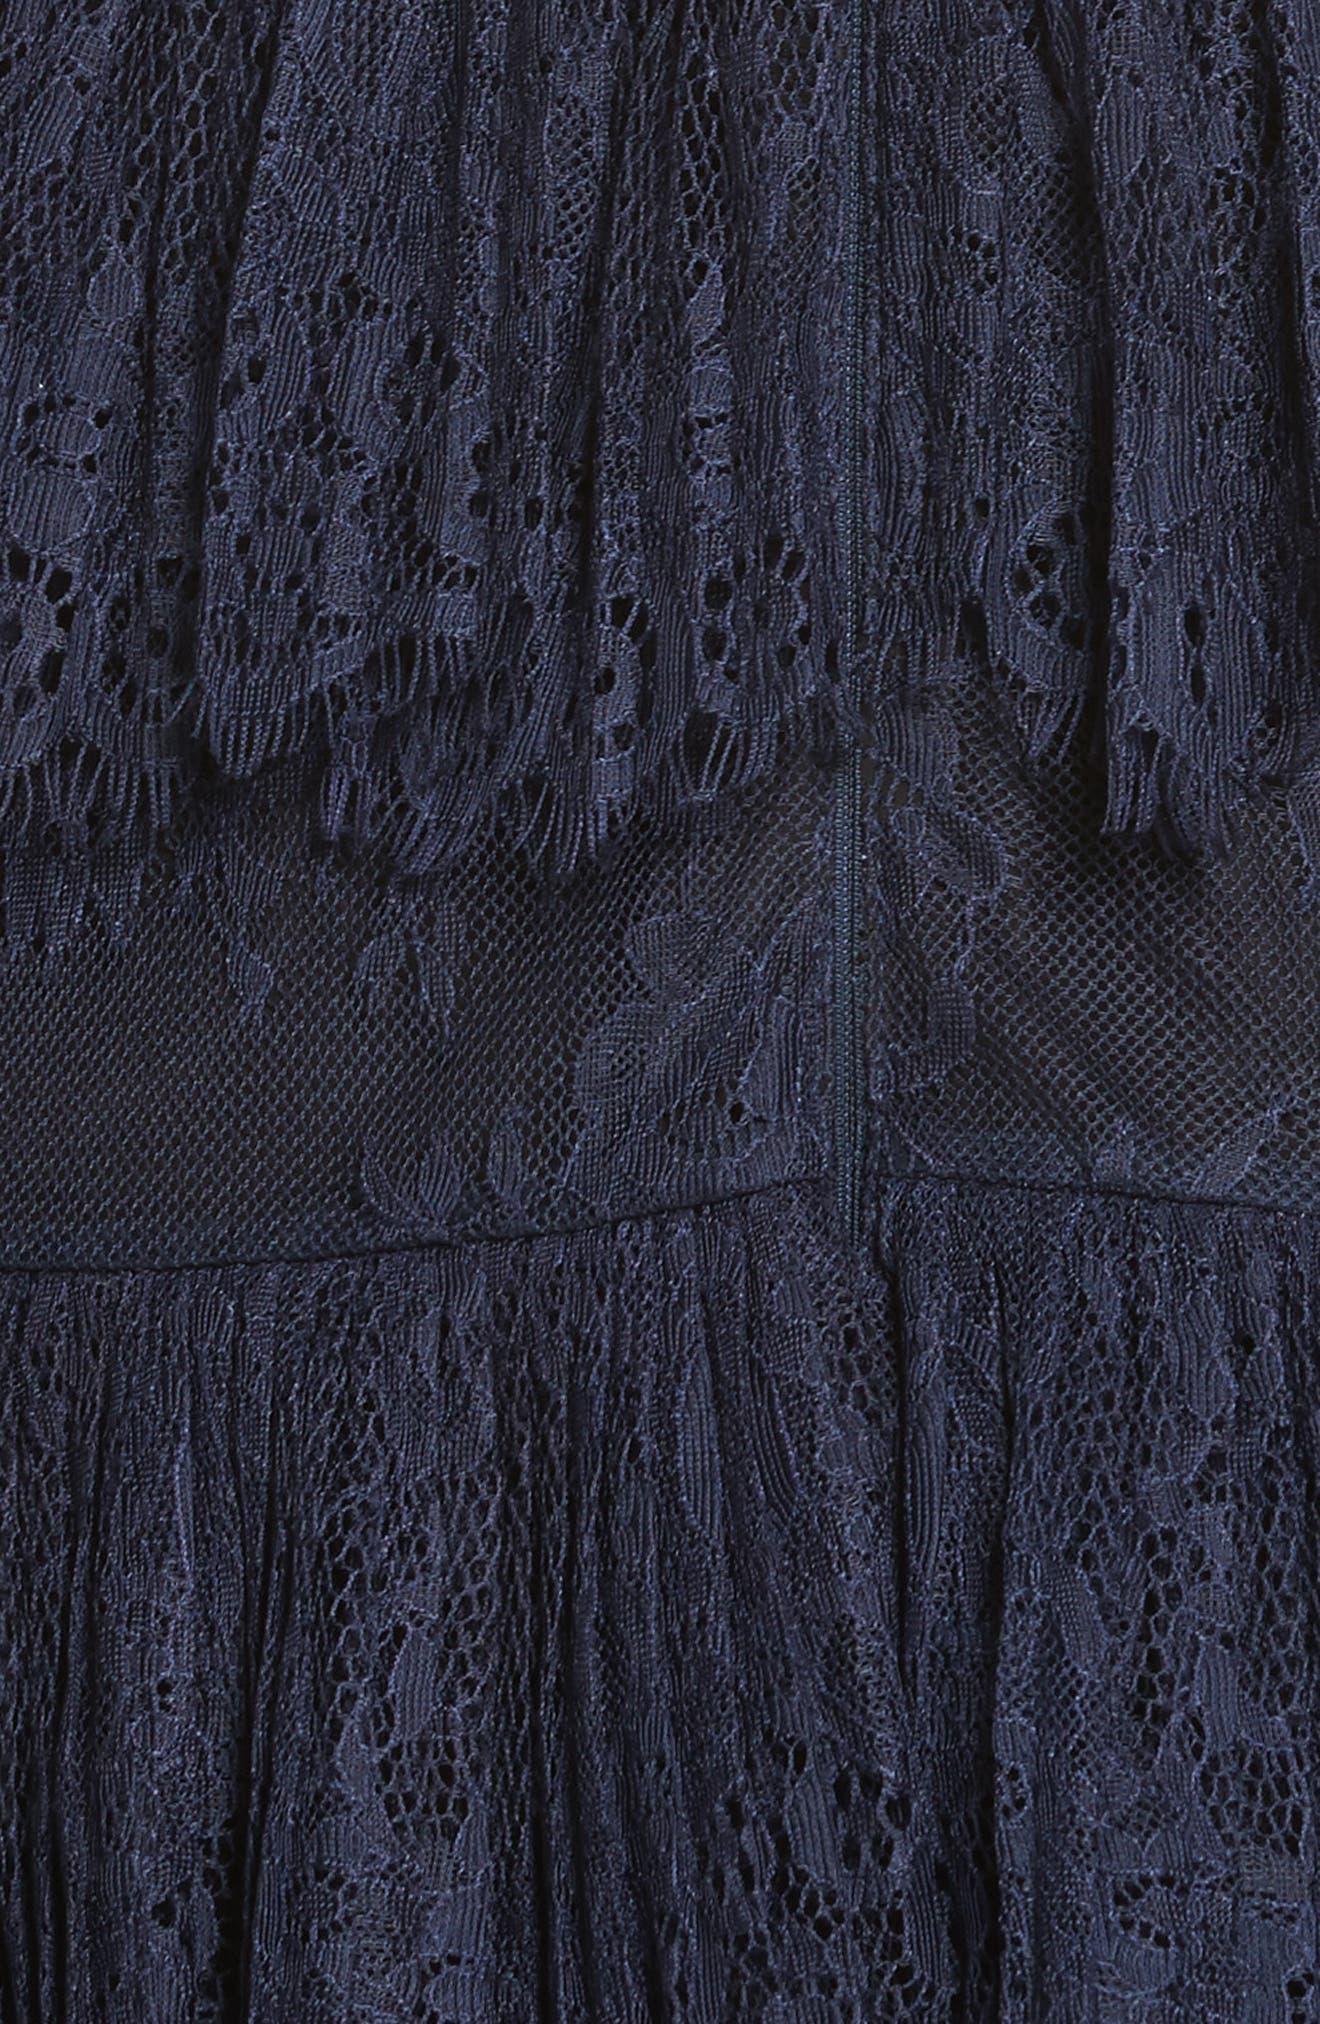 Pleated Lace Dress,                             Alternate thumbnail 5, color,                             Dark Blue